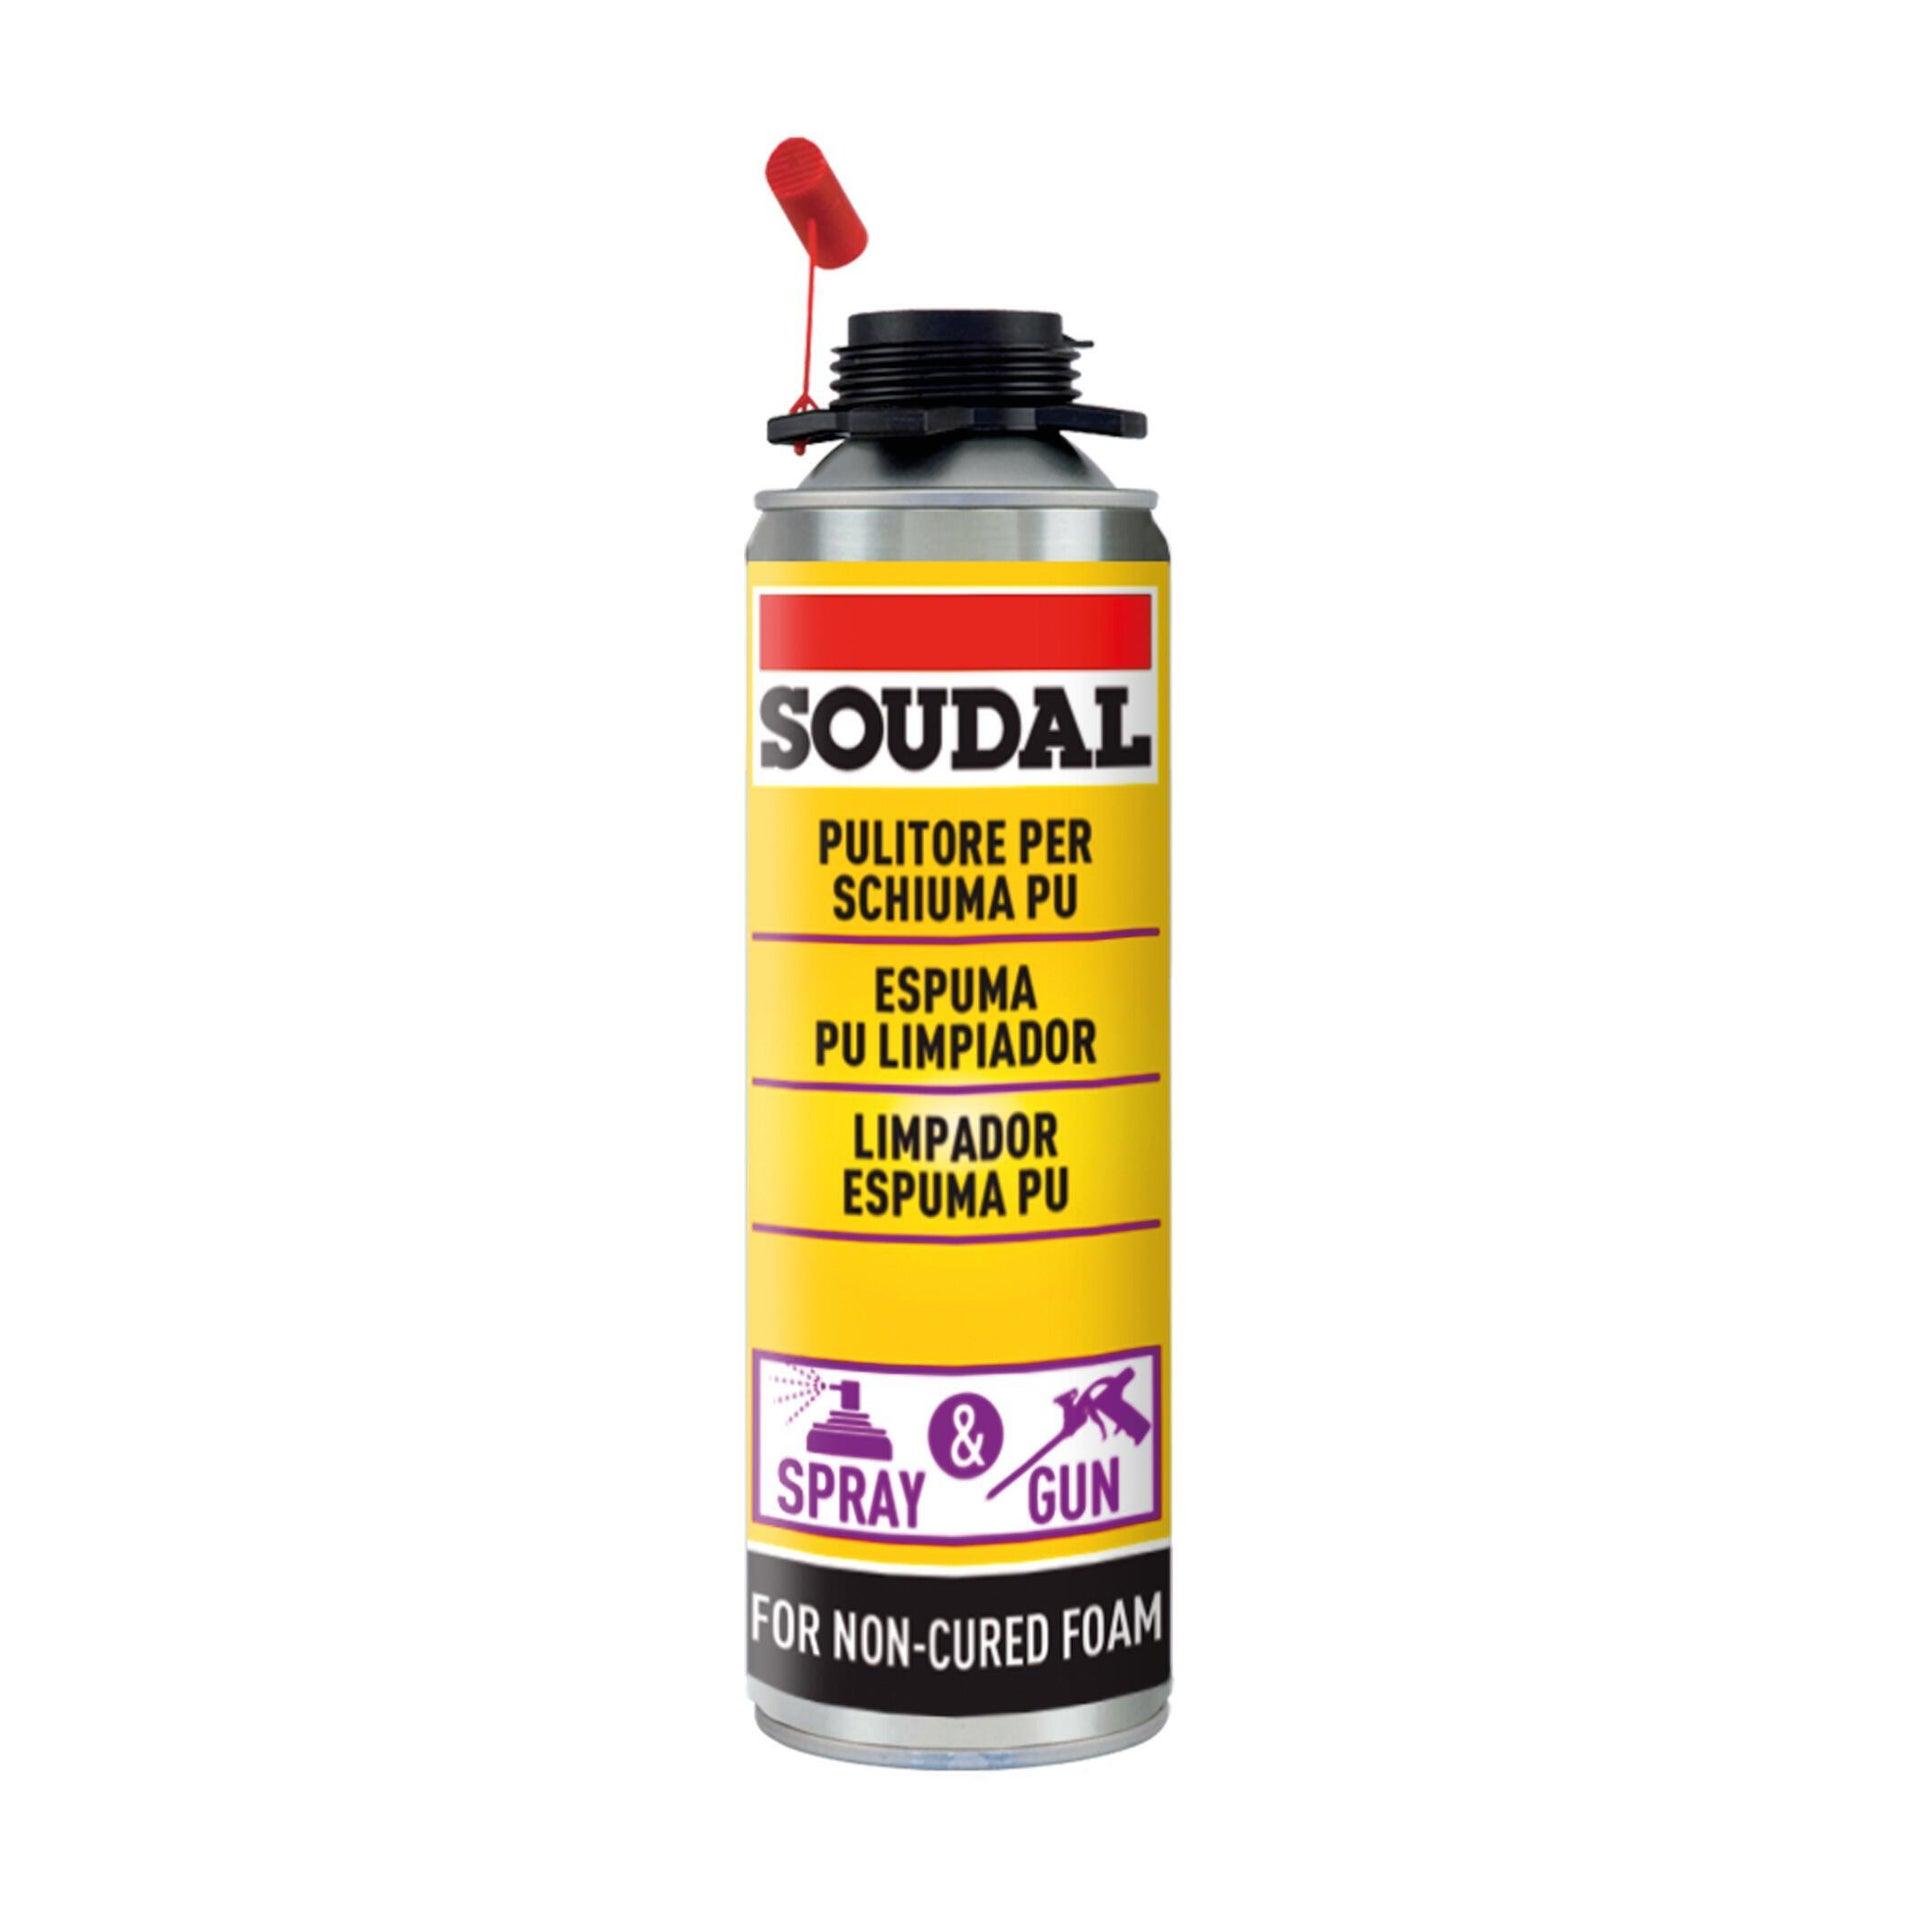 Detergente per schiuma e pistola SOUDAL Pulitore trasparente 150ml - 3